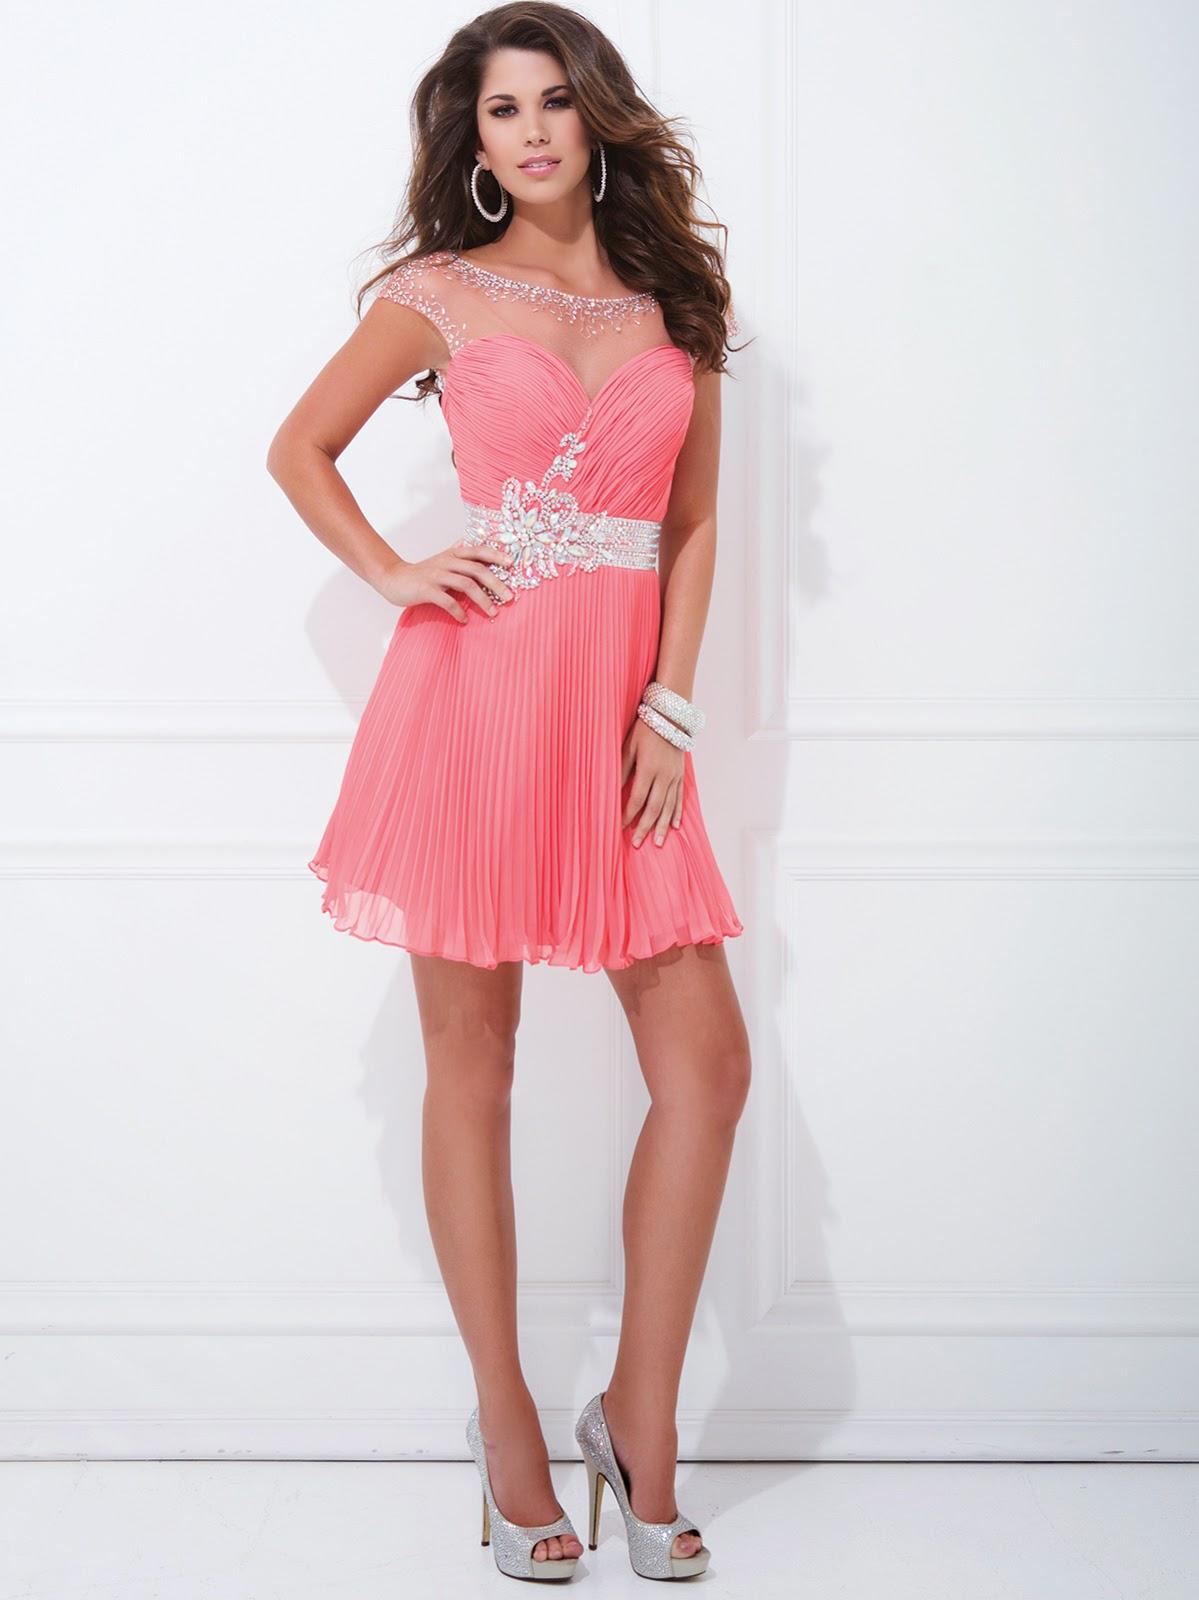 Increibles vestidos de fiesta baratos | Tendencias | Vestidos | Moda ...